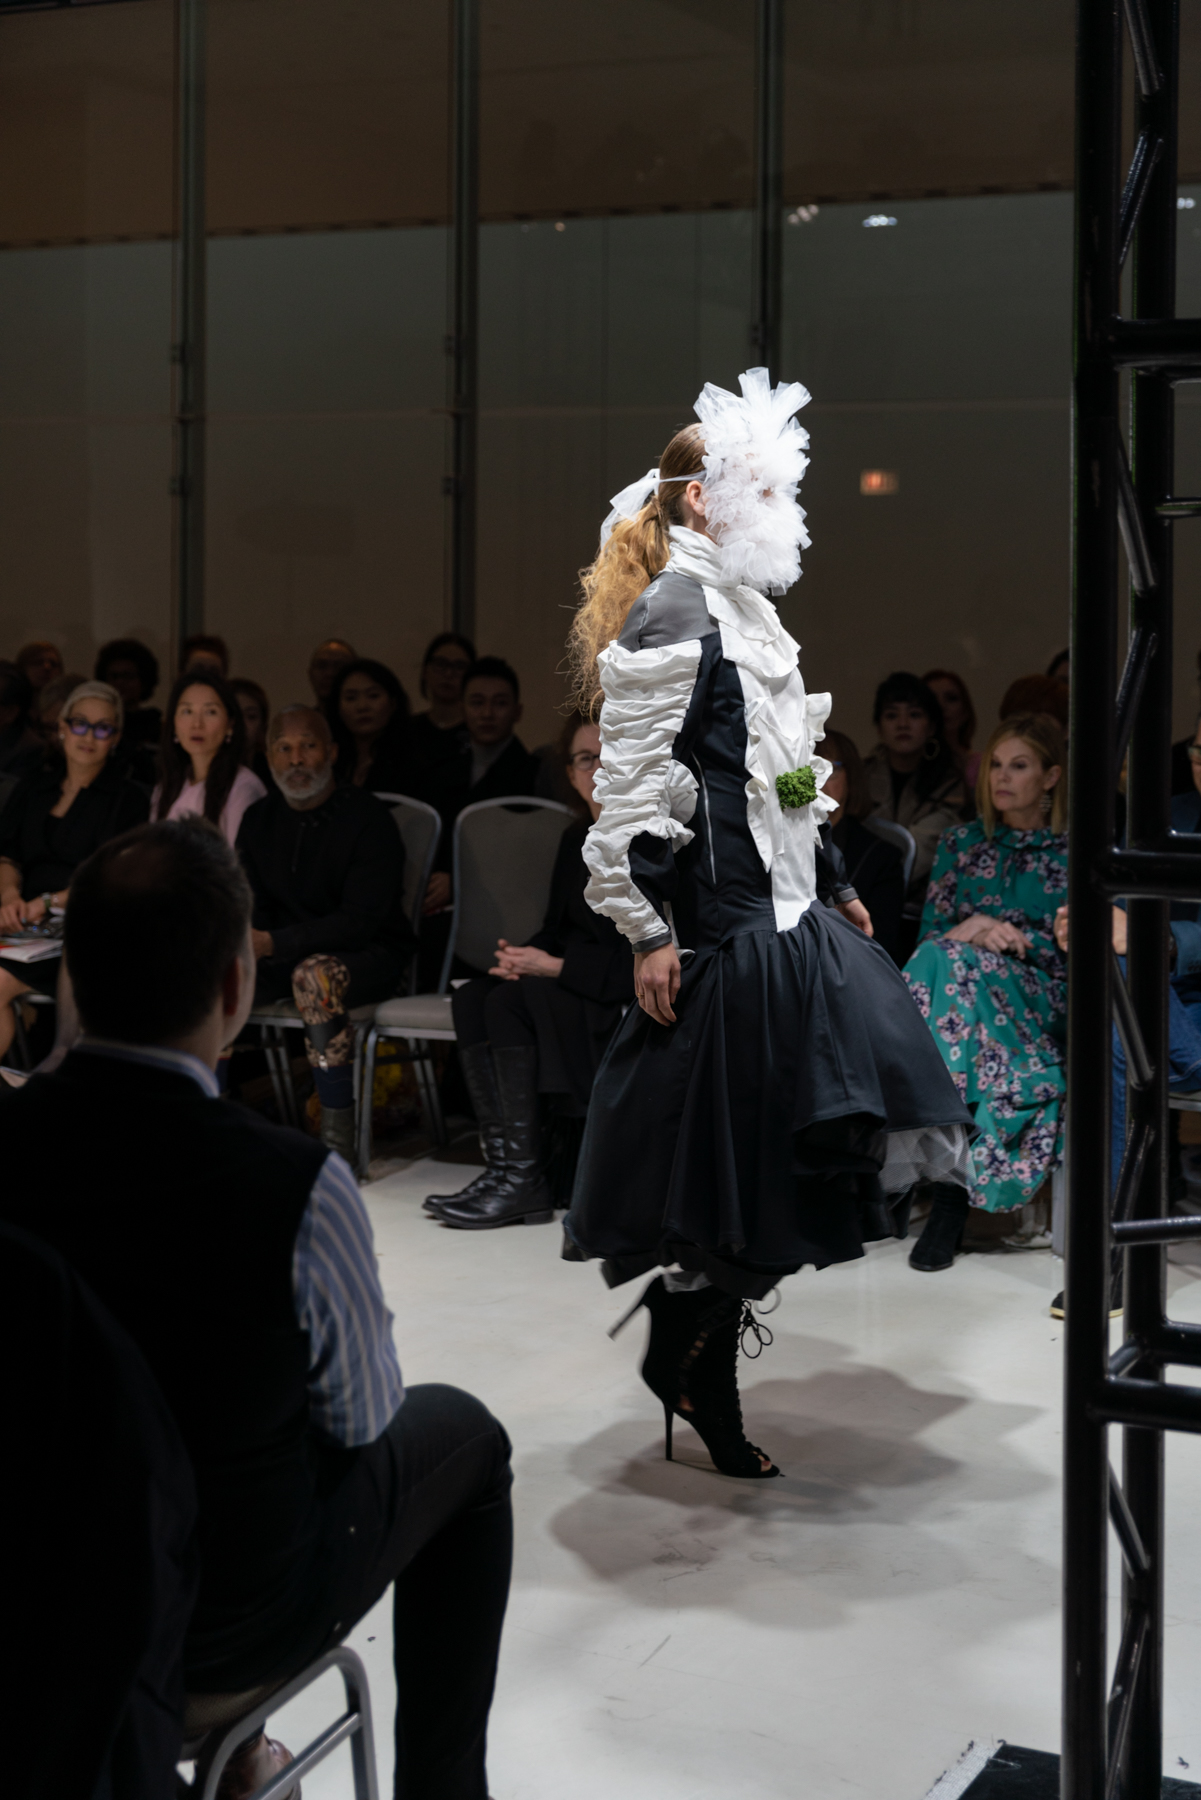 connor_fenwick_saic_fashion_event_05.jpg